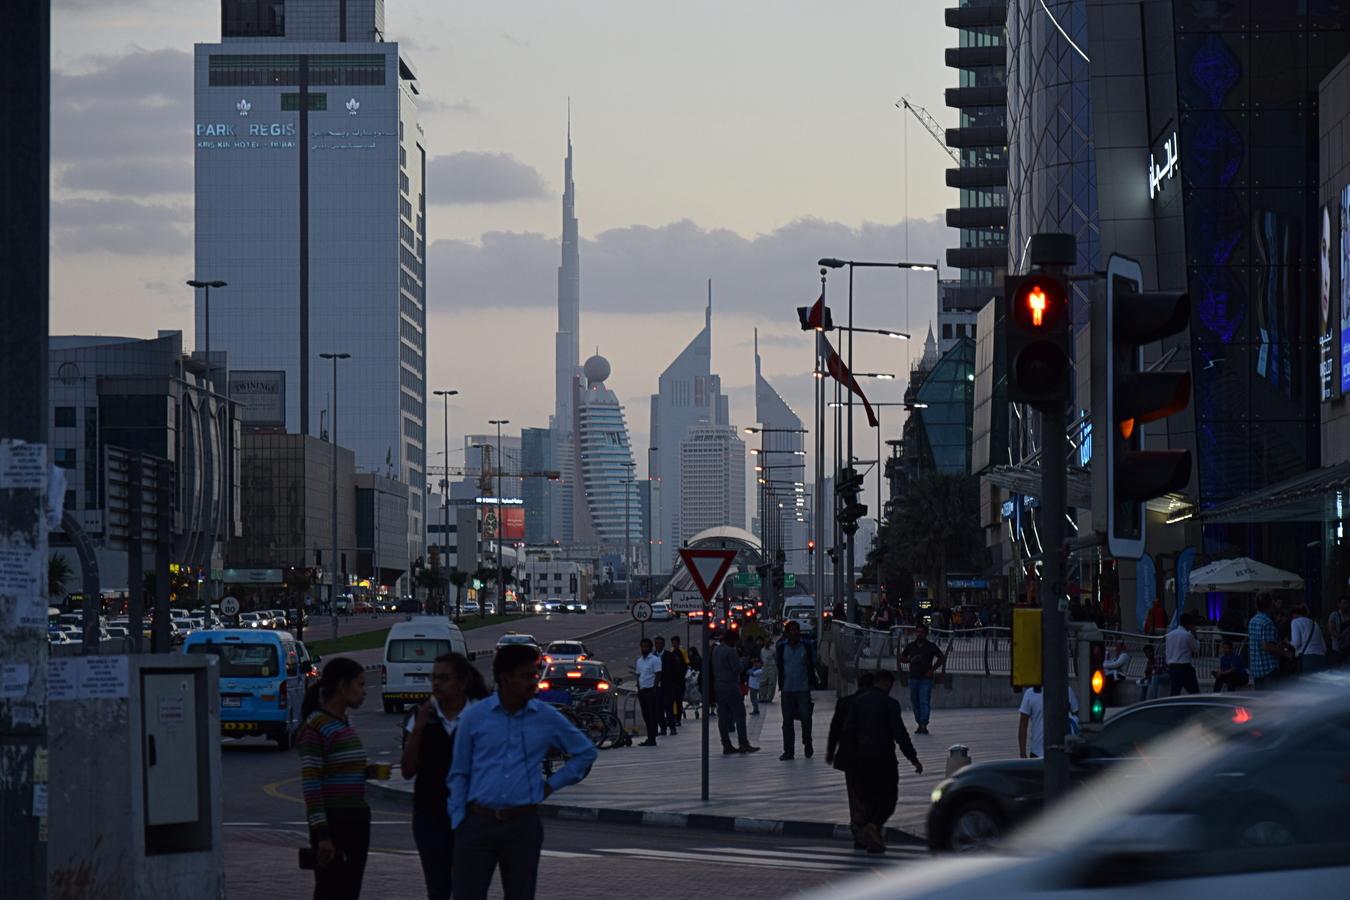 Soumrak nad Sheikh Khalifa Bin Zayed st.